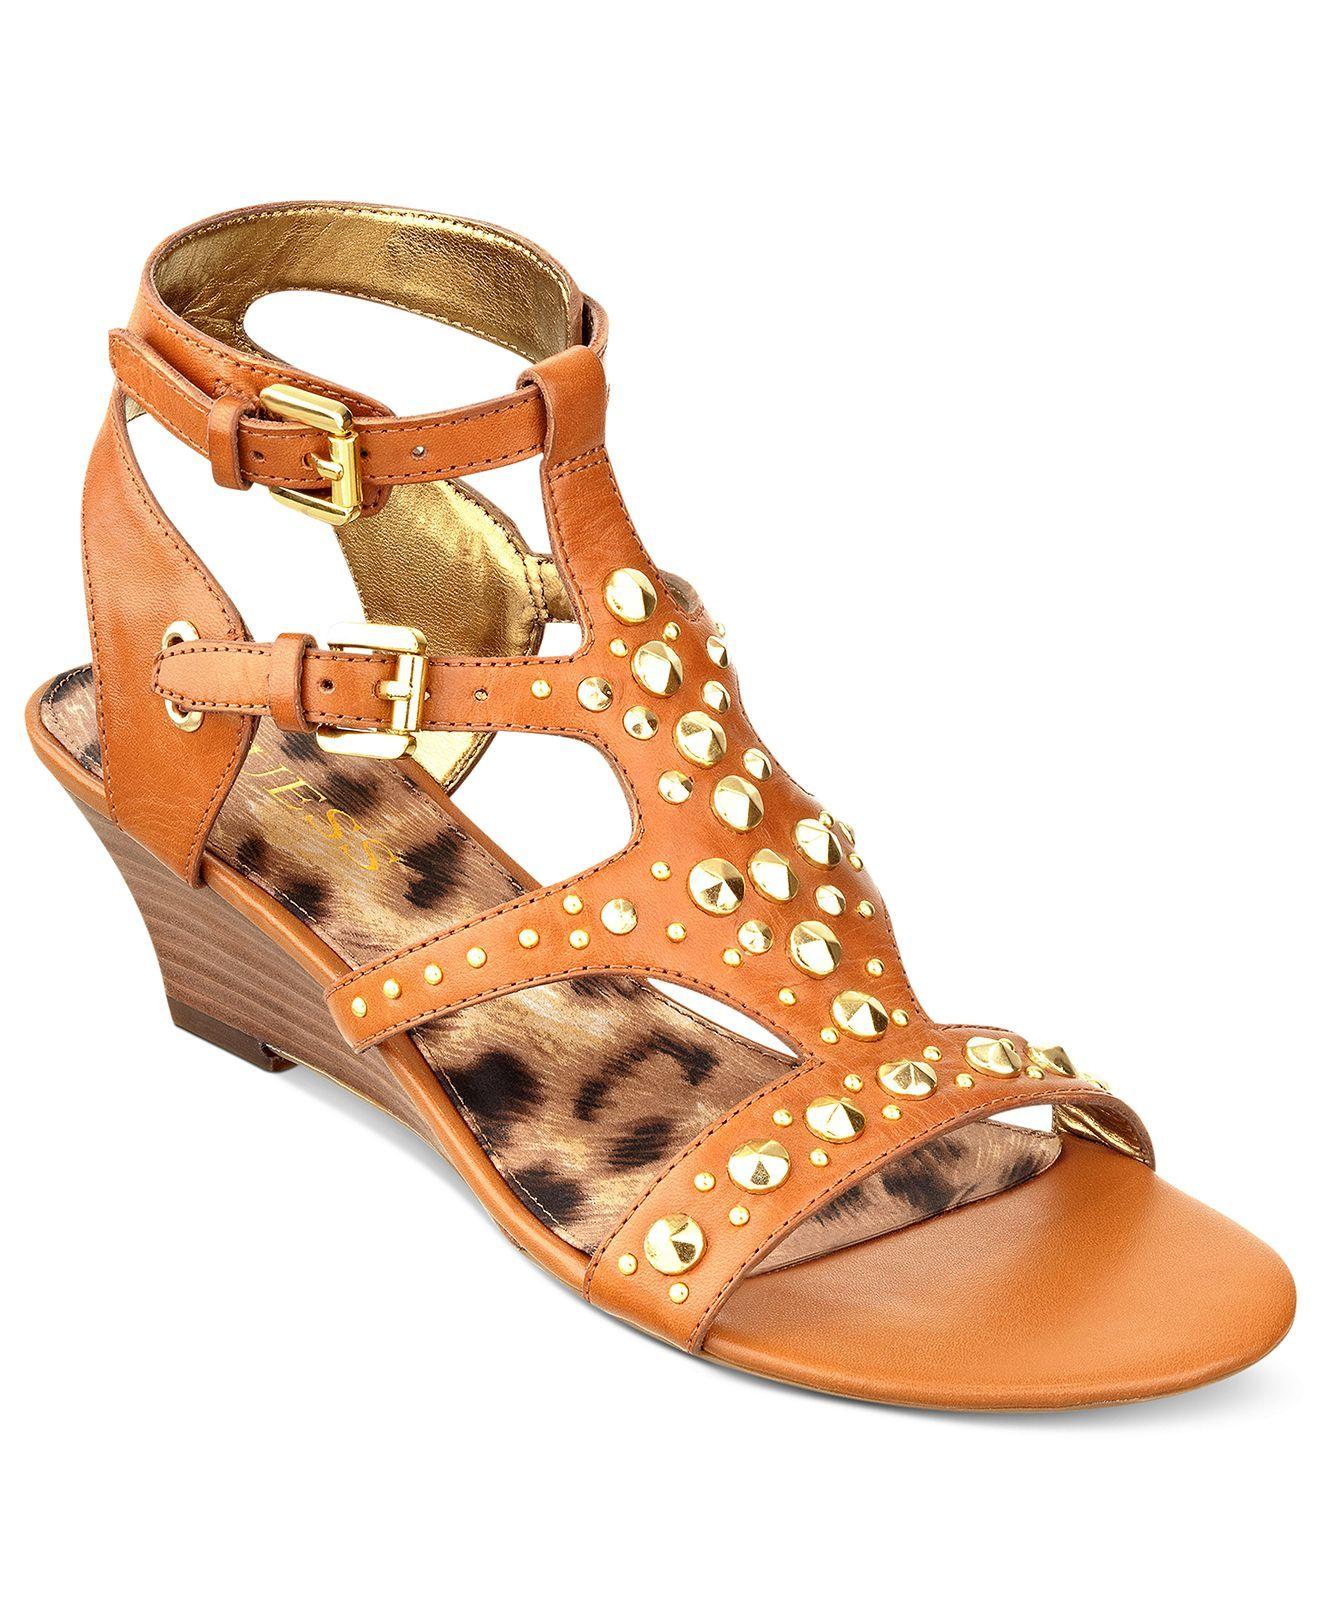 a2a5fdbaa88 GUESS Women s Aidana Demi Wedge Sandals - Sandals - Shoes - Macy s ...